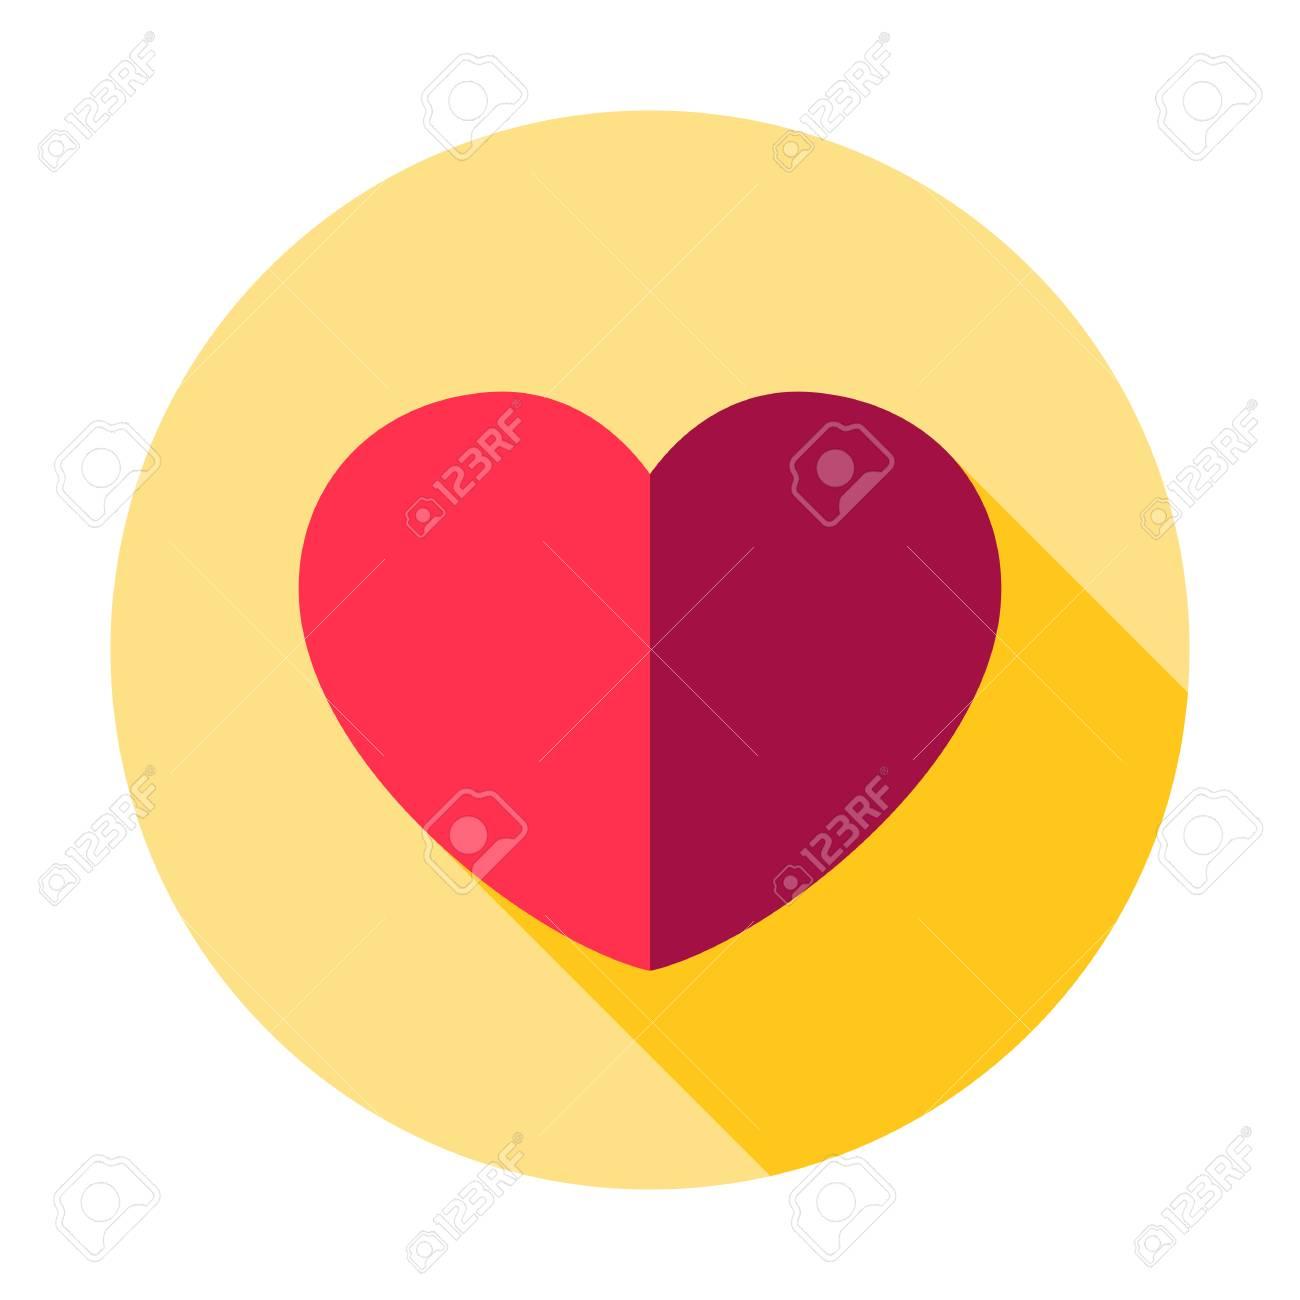 Heart icon vector. Wedding Love graphic symbol. Valentine's day sign, Simple Heart shape emblem isolated design. Health care illustration. Romantic, romance button. Passion symbol. Web icon - 112464006